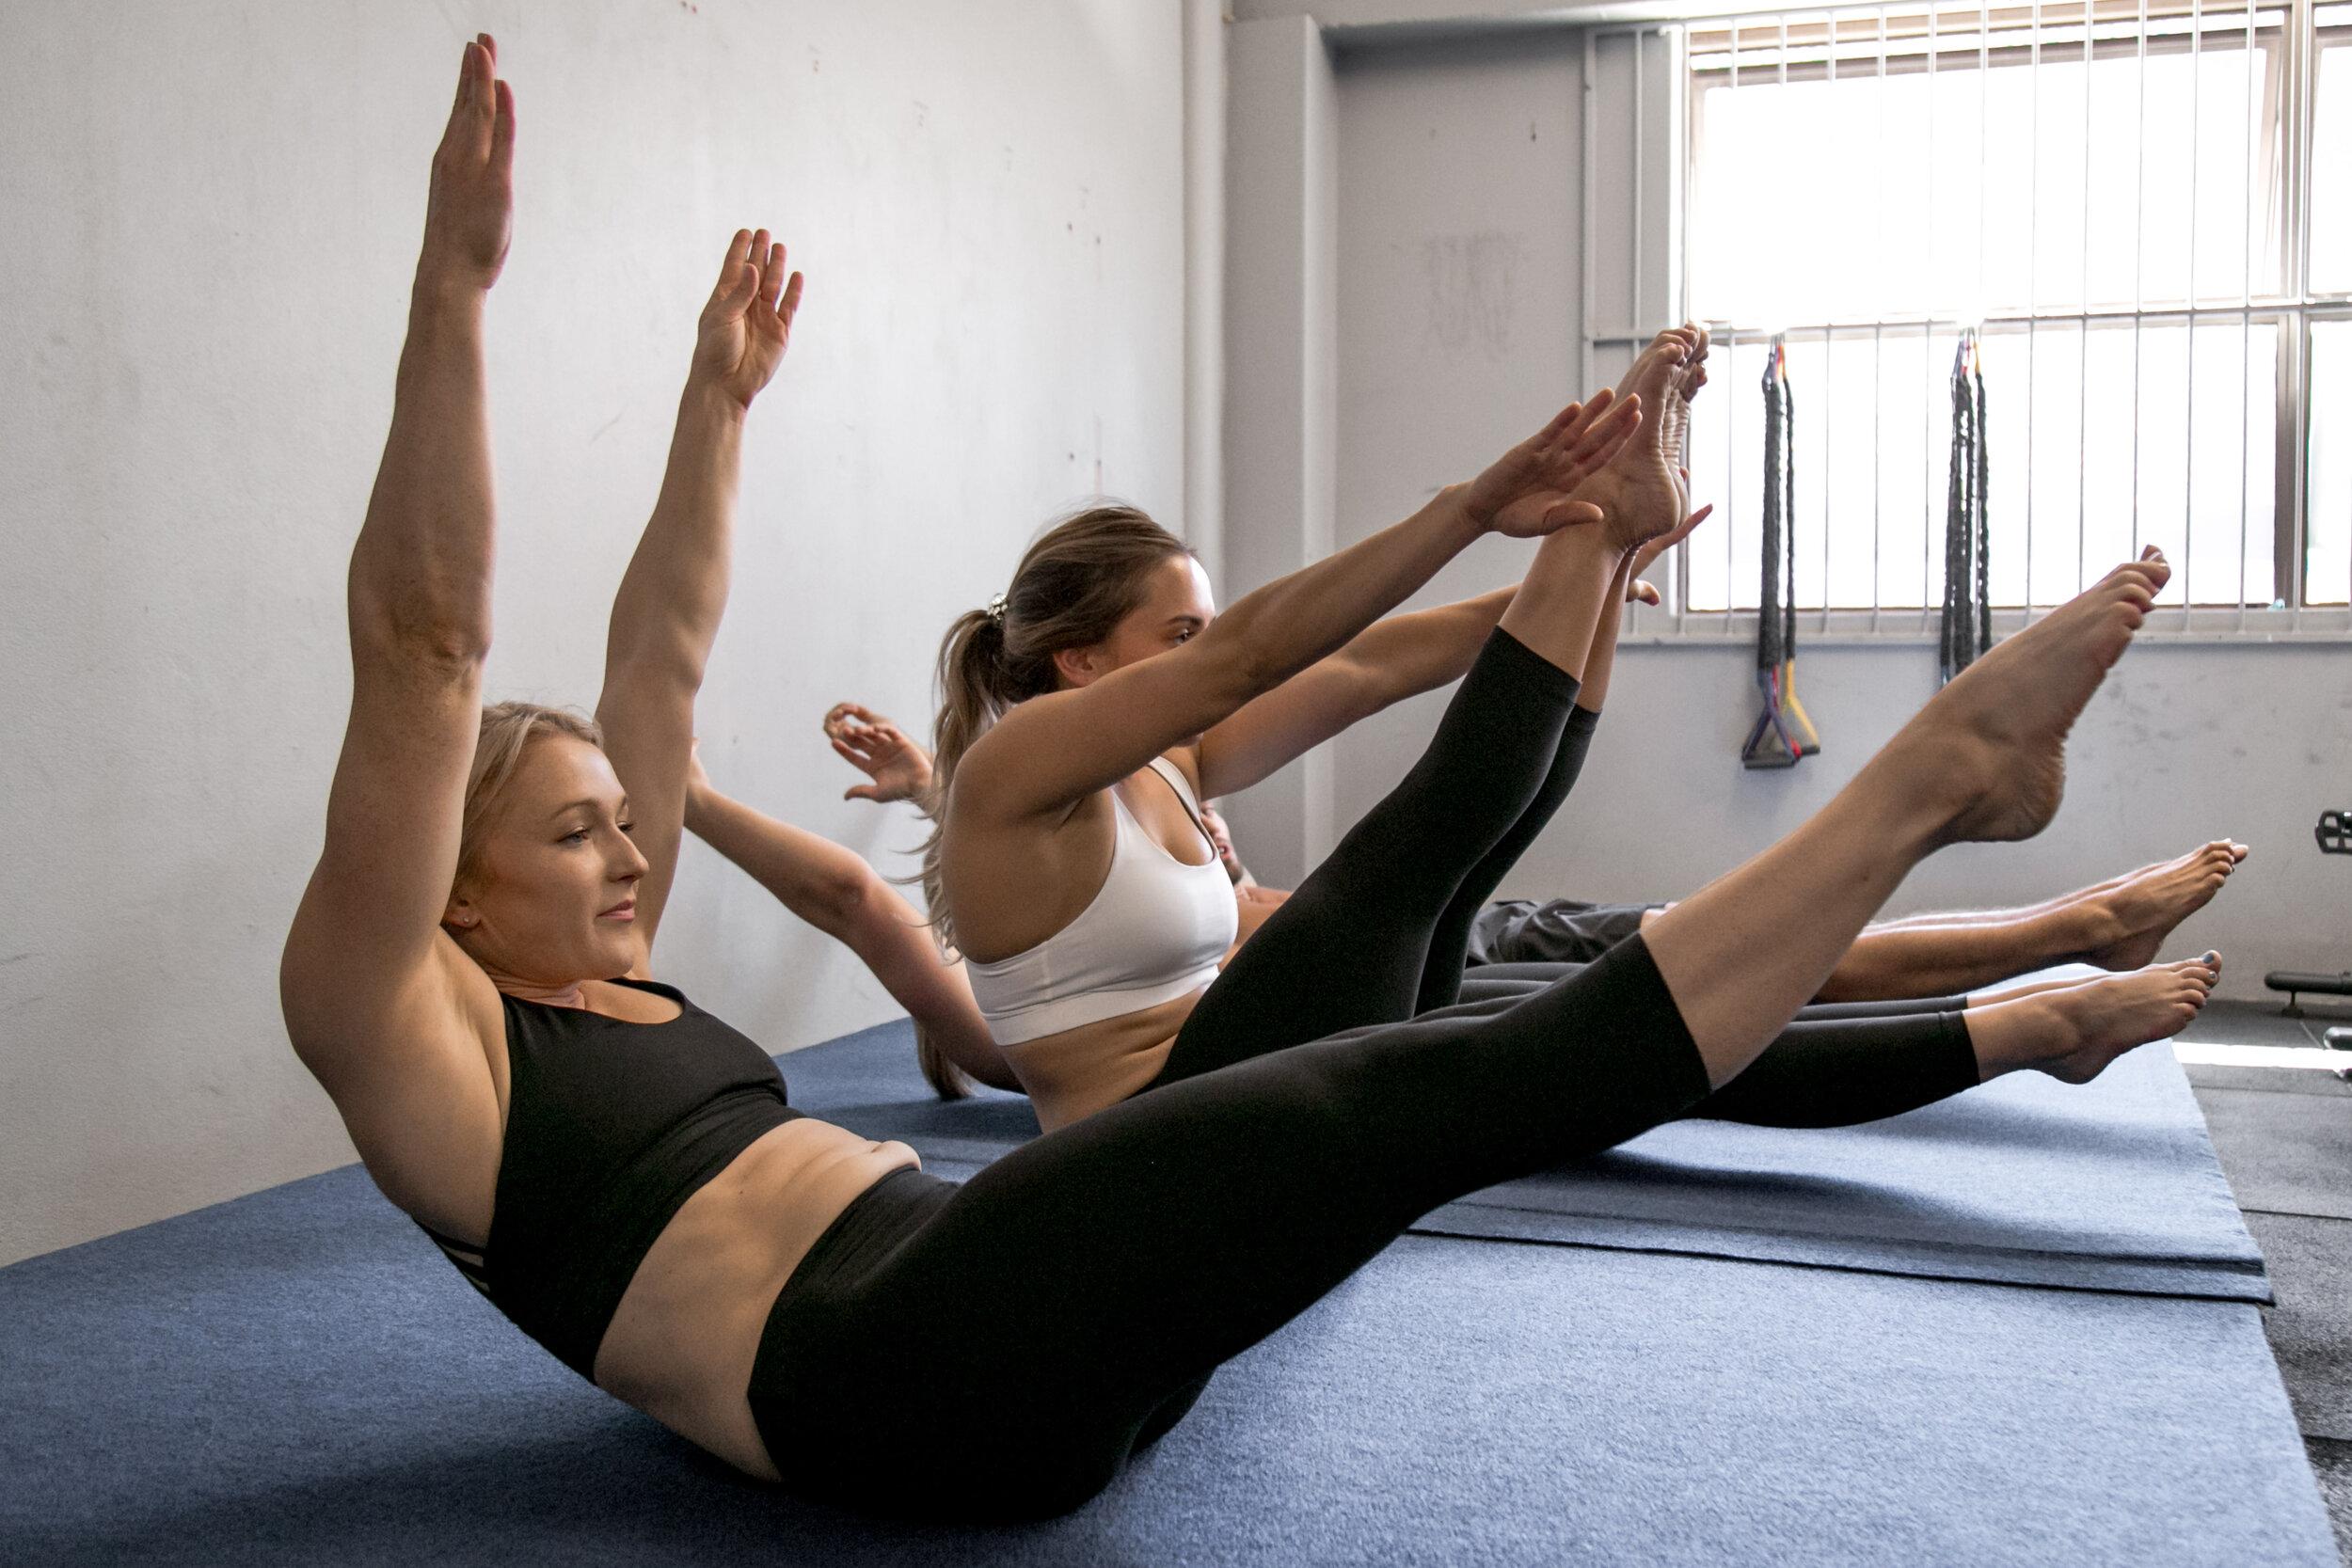 Female gymnasts completing training plan. V snaps.